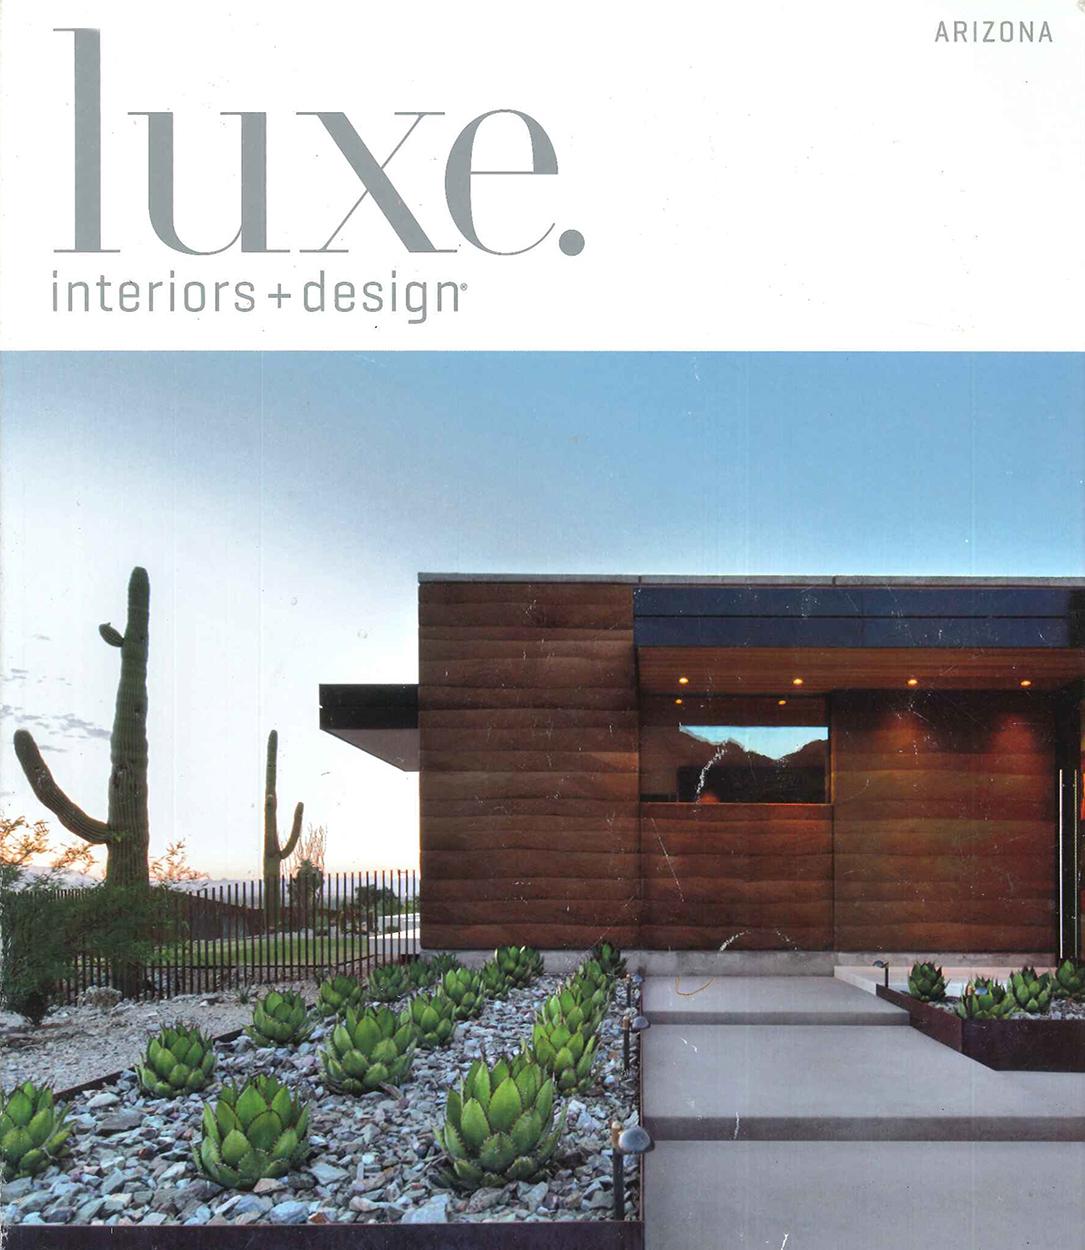 luxe. interiors + design - Winter 2015; Scottsdale